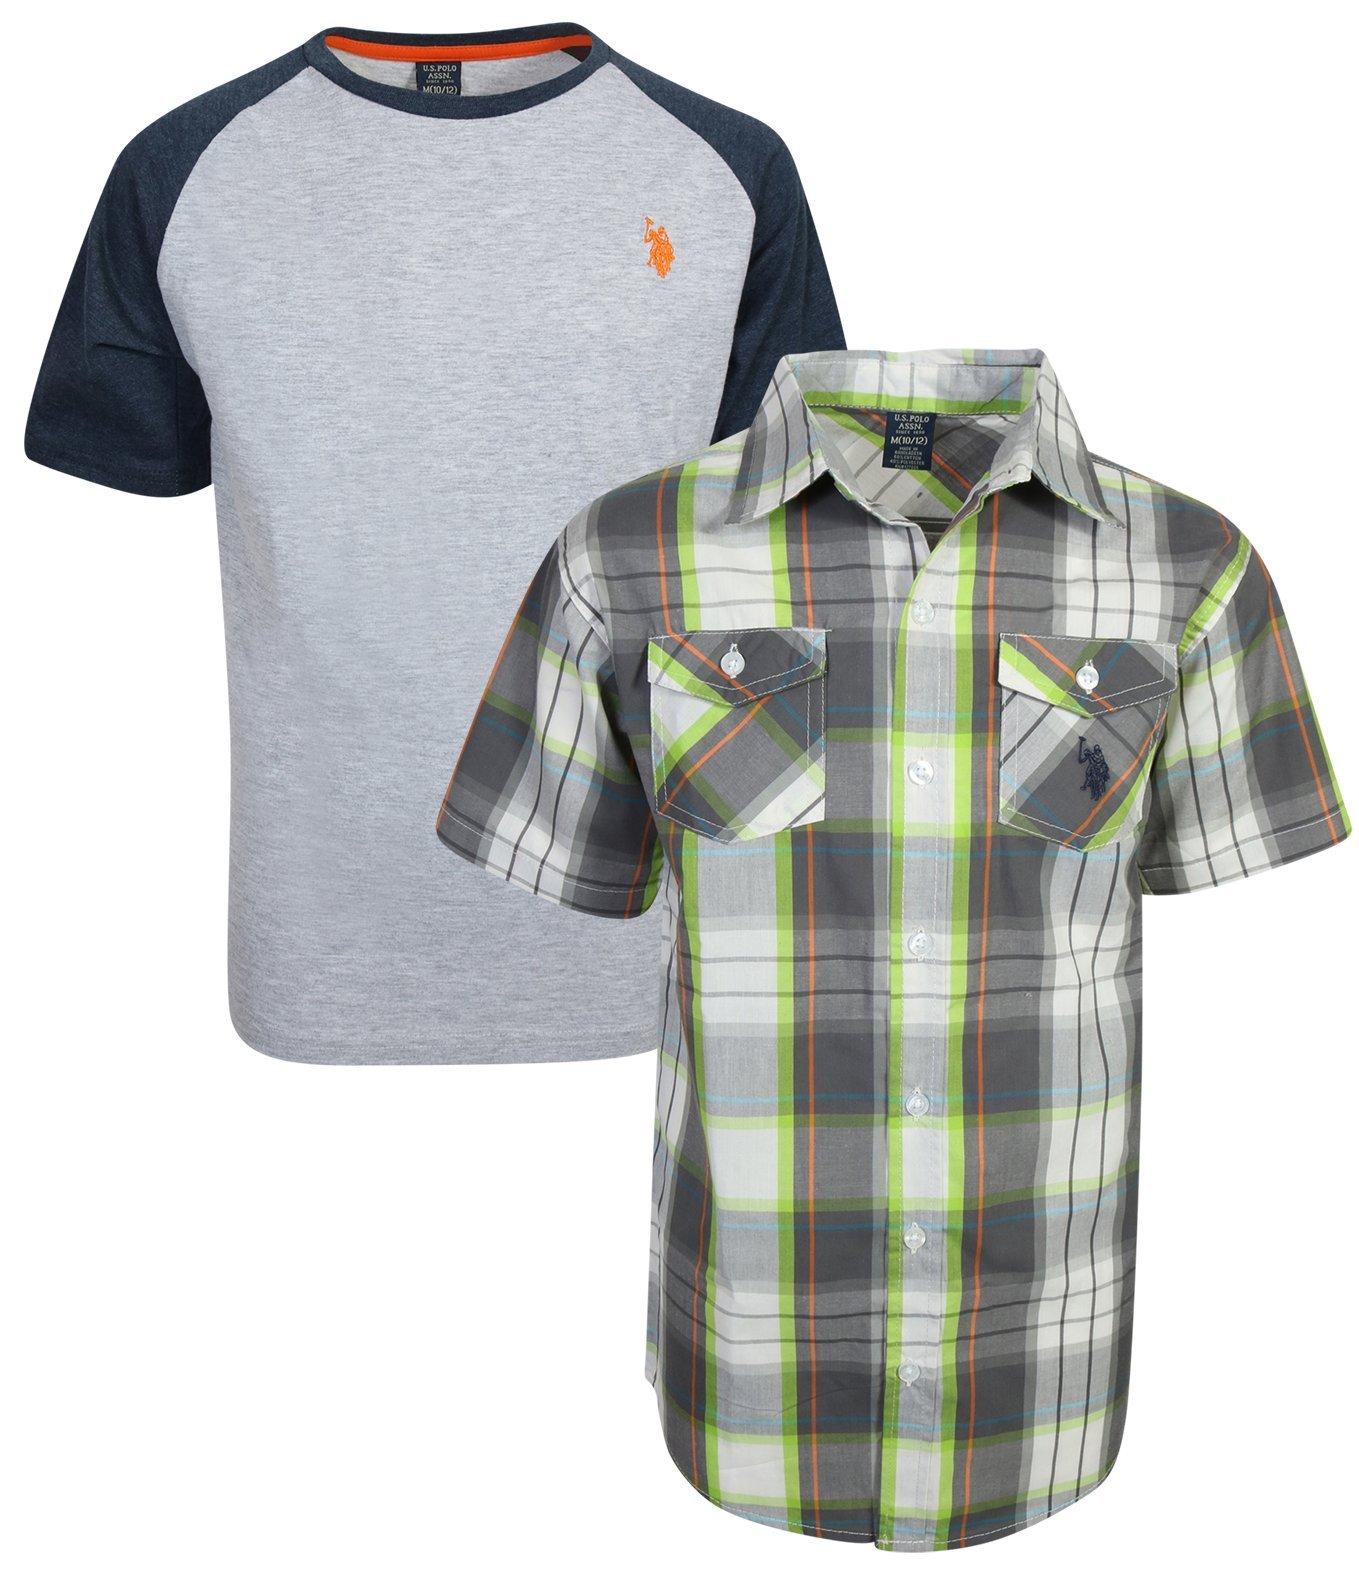 U.S. Polo Assn. Boy's Short Sleeve Button Down Shirt 2 Piece Set, Grey Plaid, Size 4'